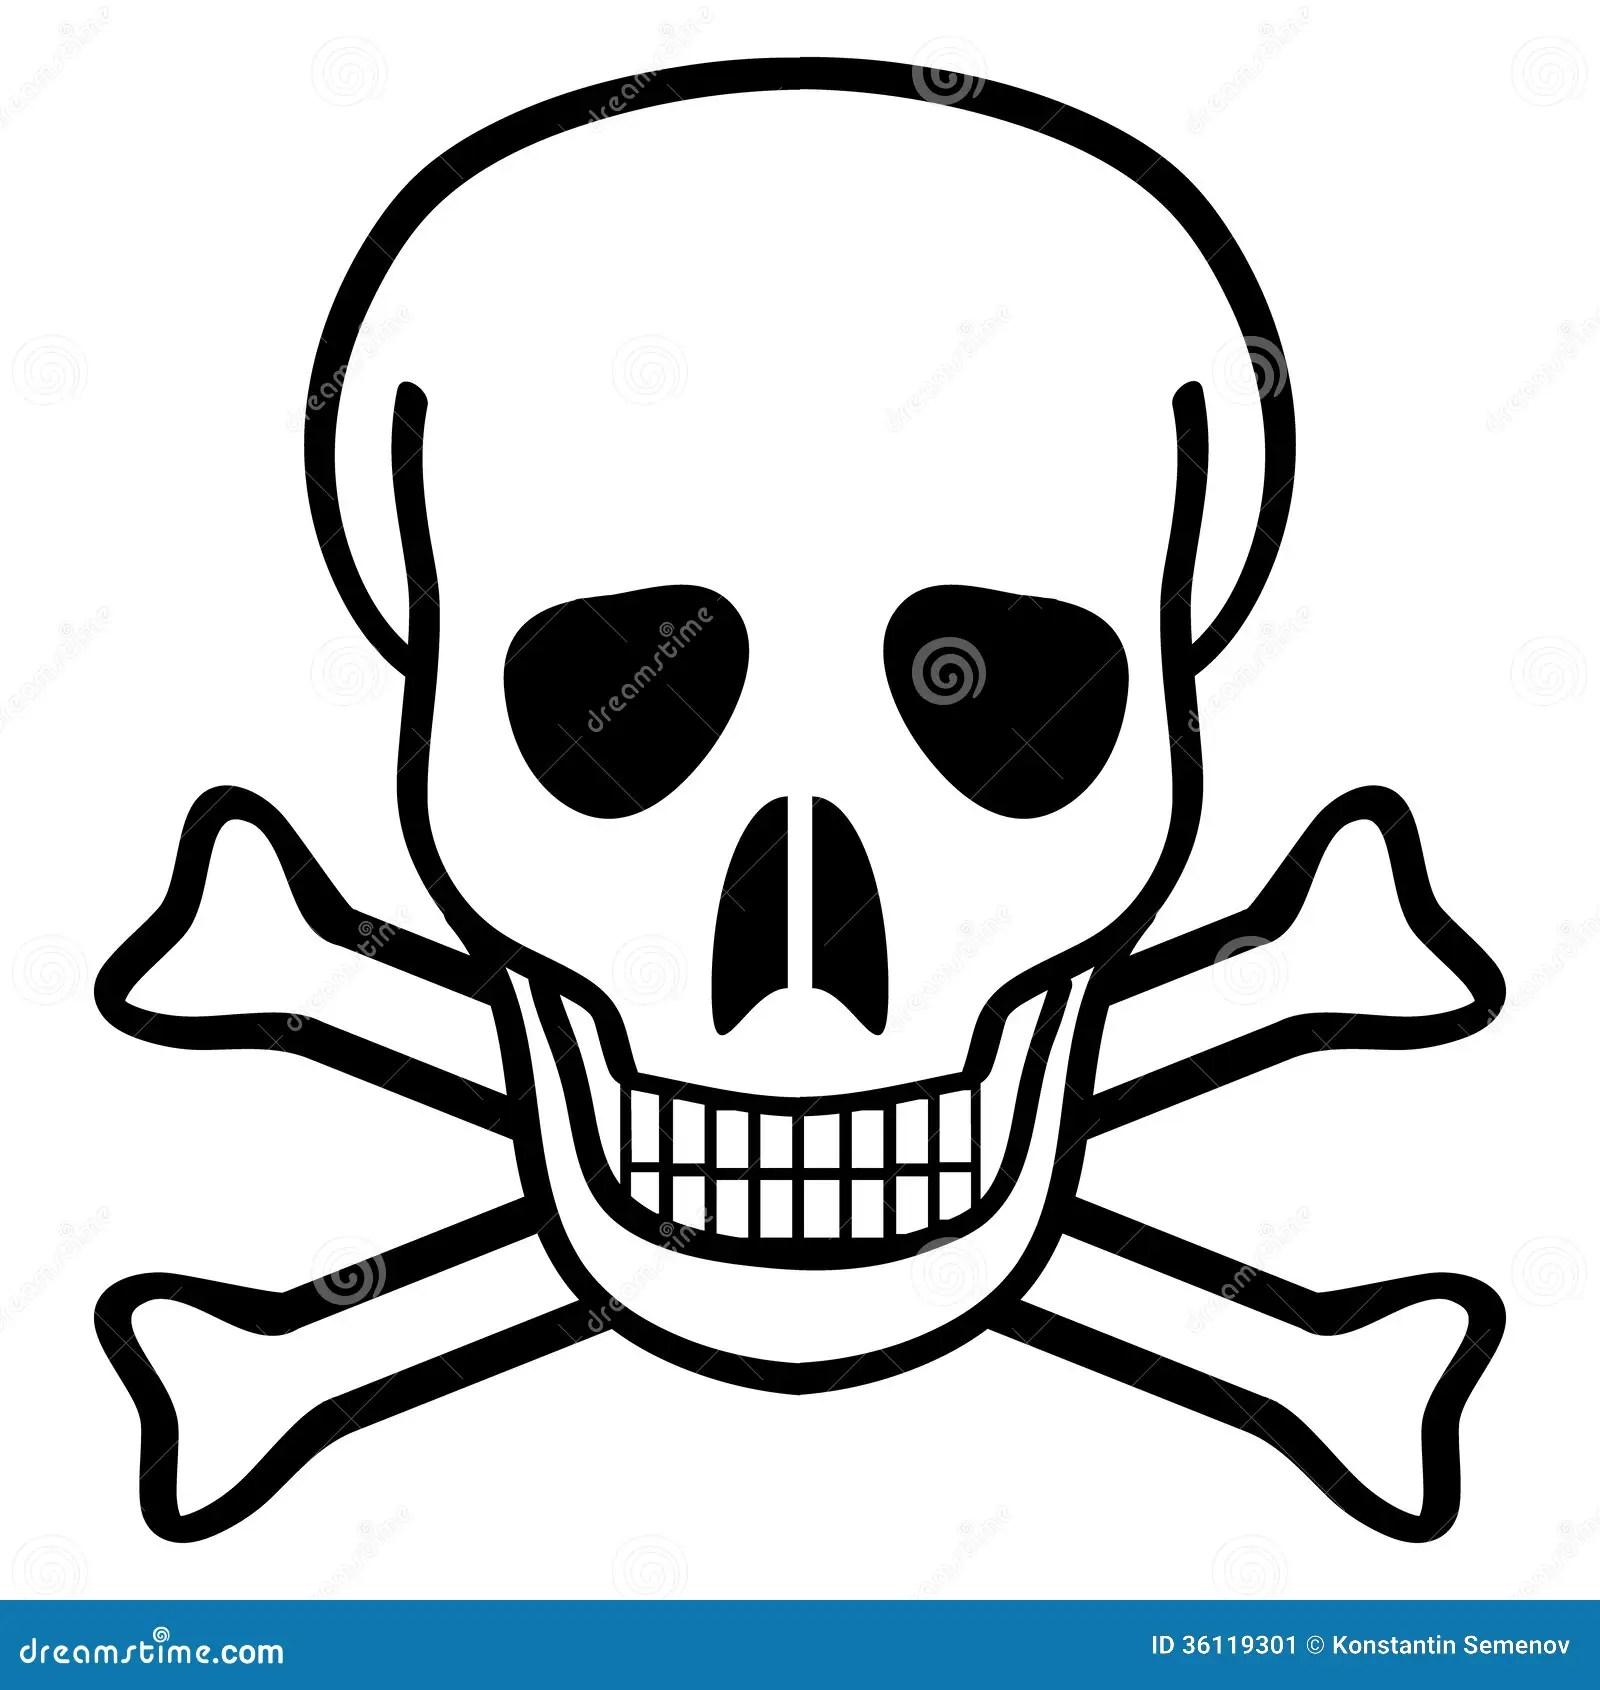 Skull And Crossbones Stock Vector Illustration Of Danger